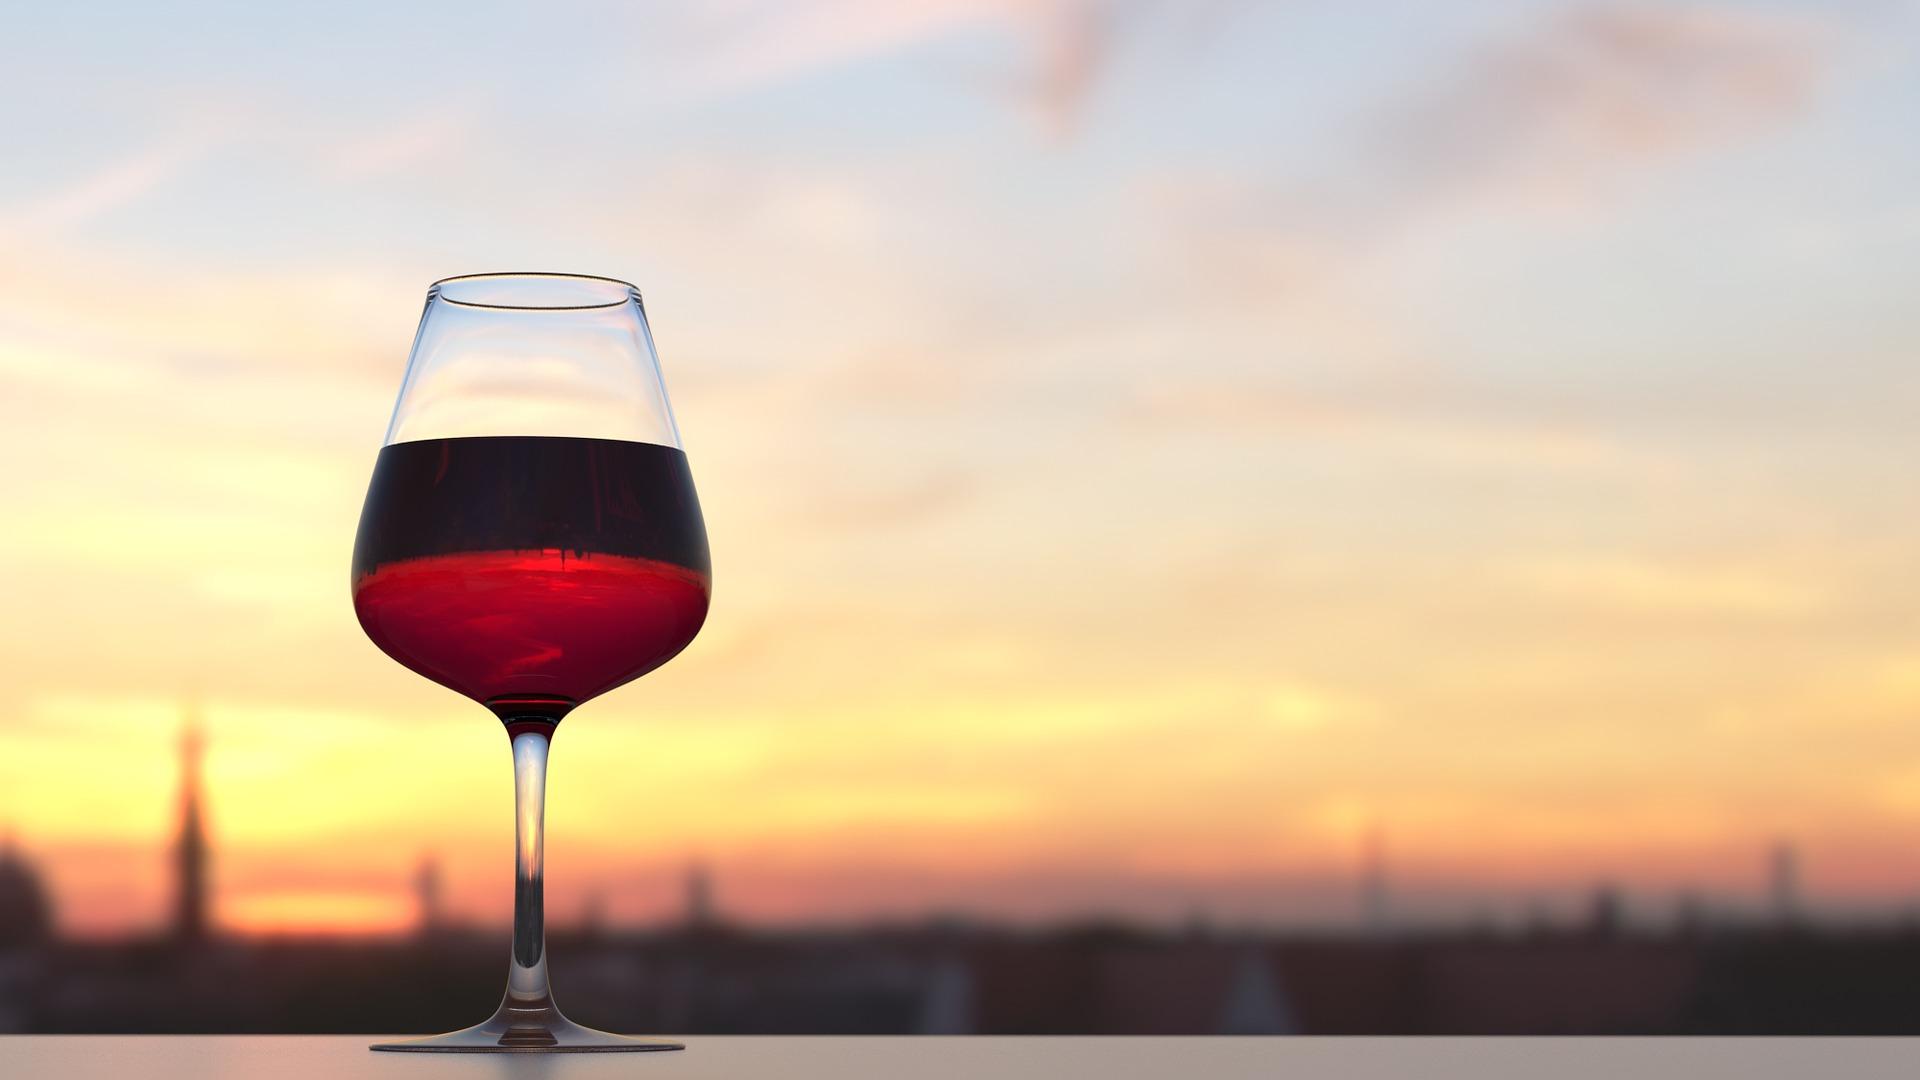 It's Wine Time